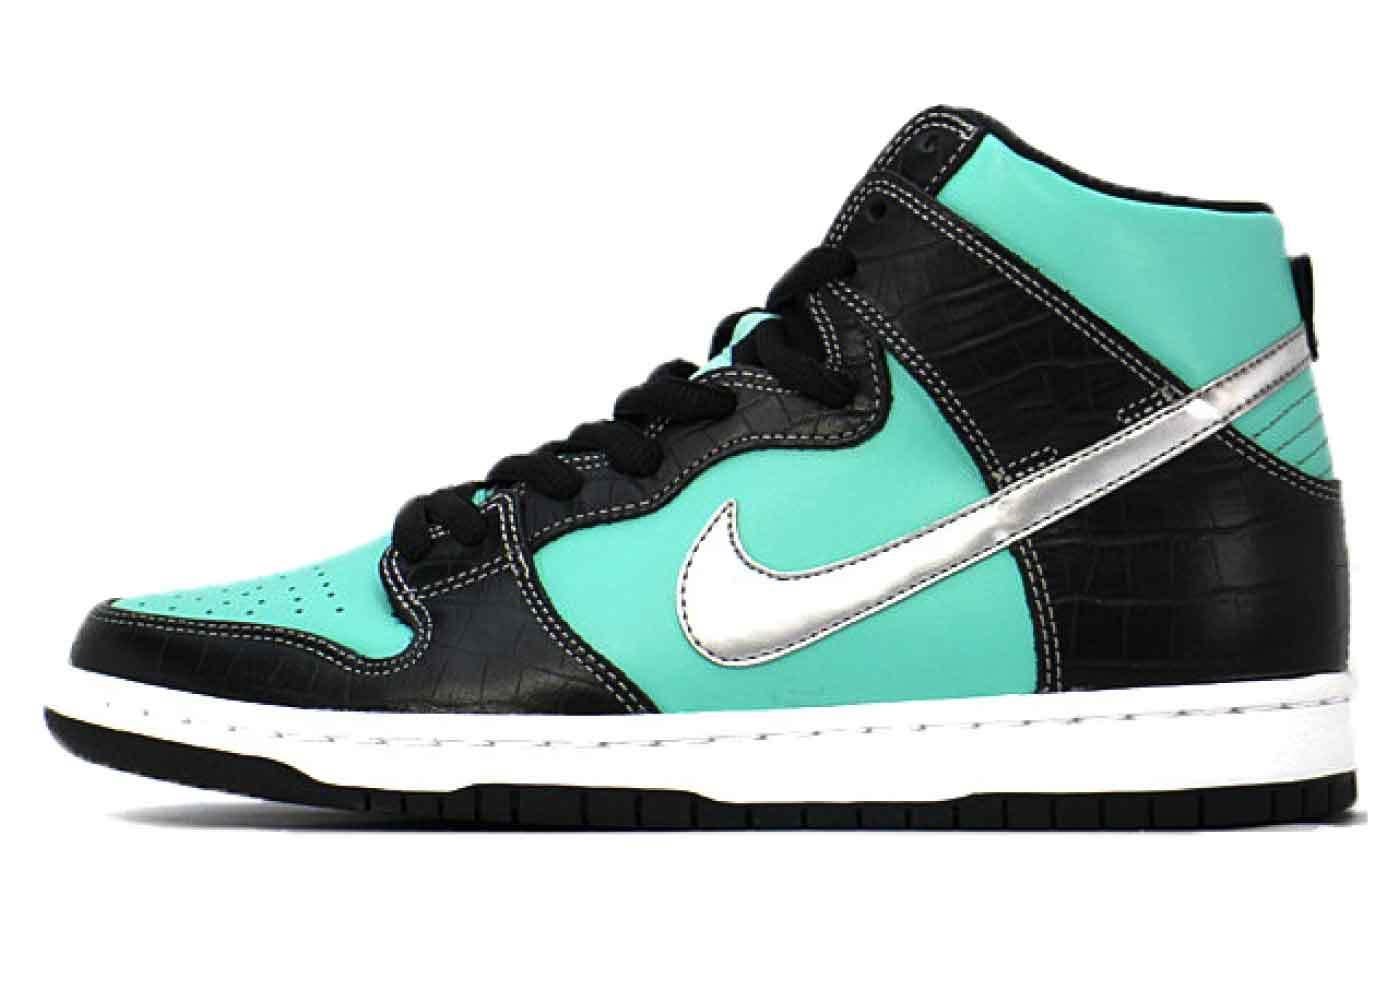 Nike SB Dunk High Diamond Supply Co